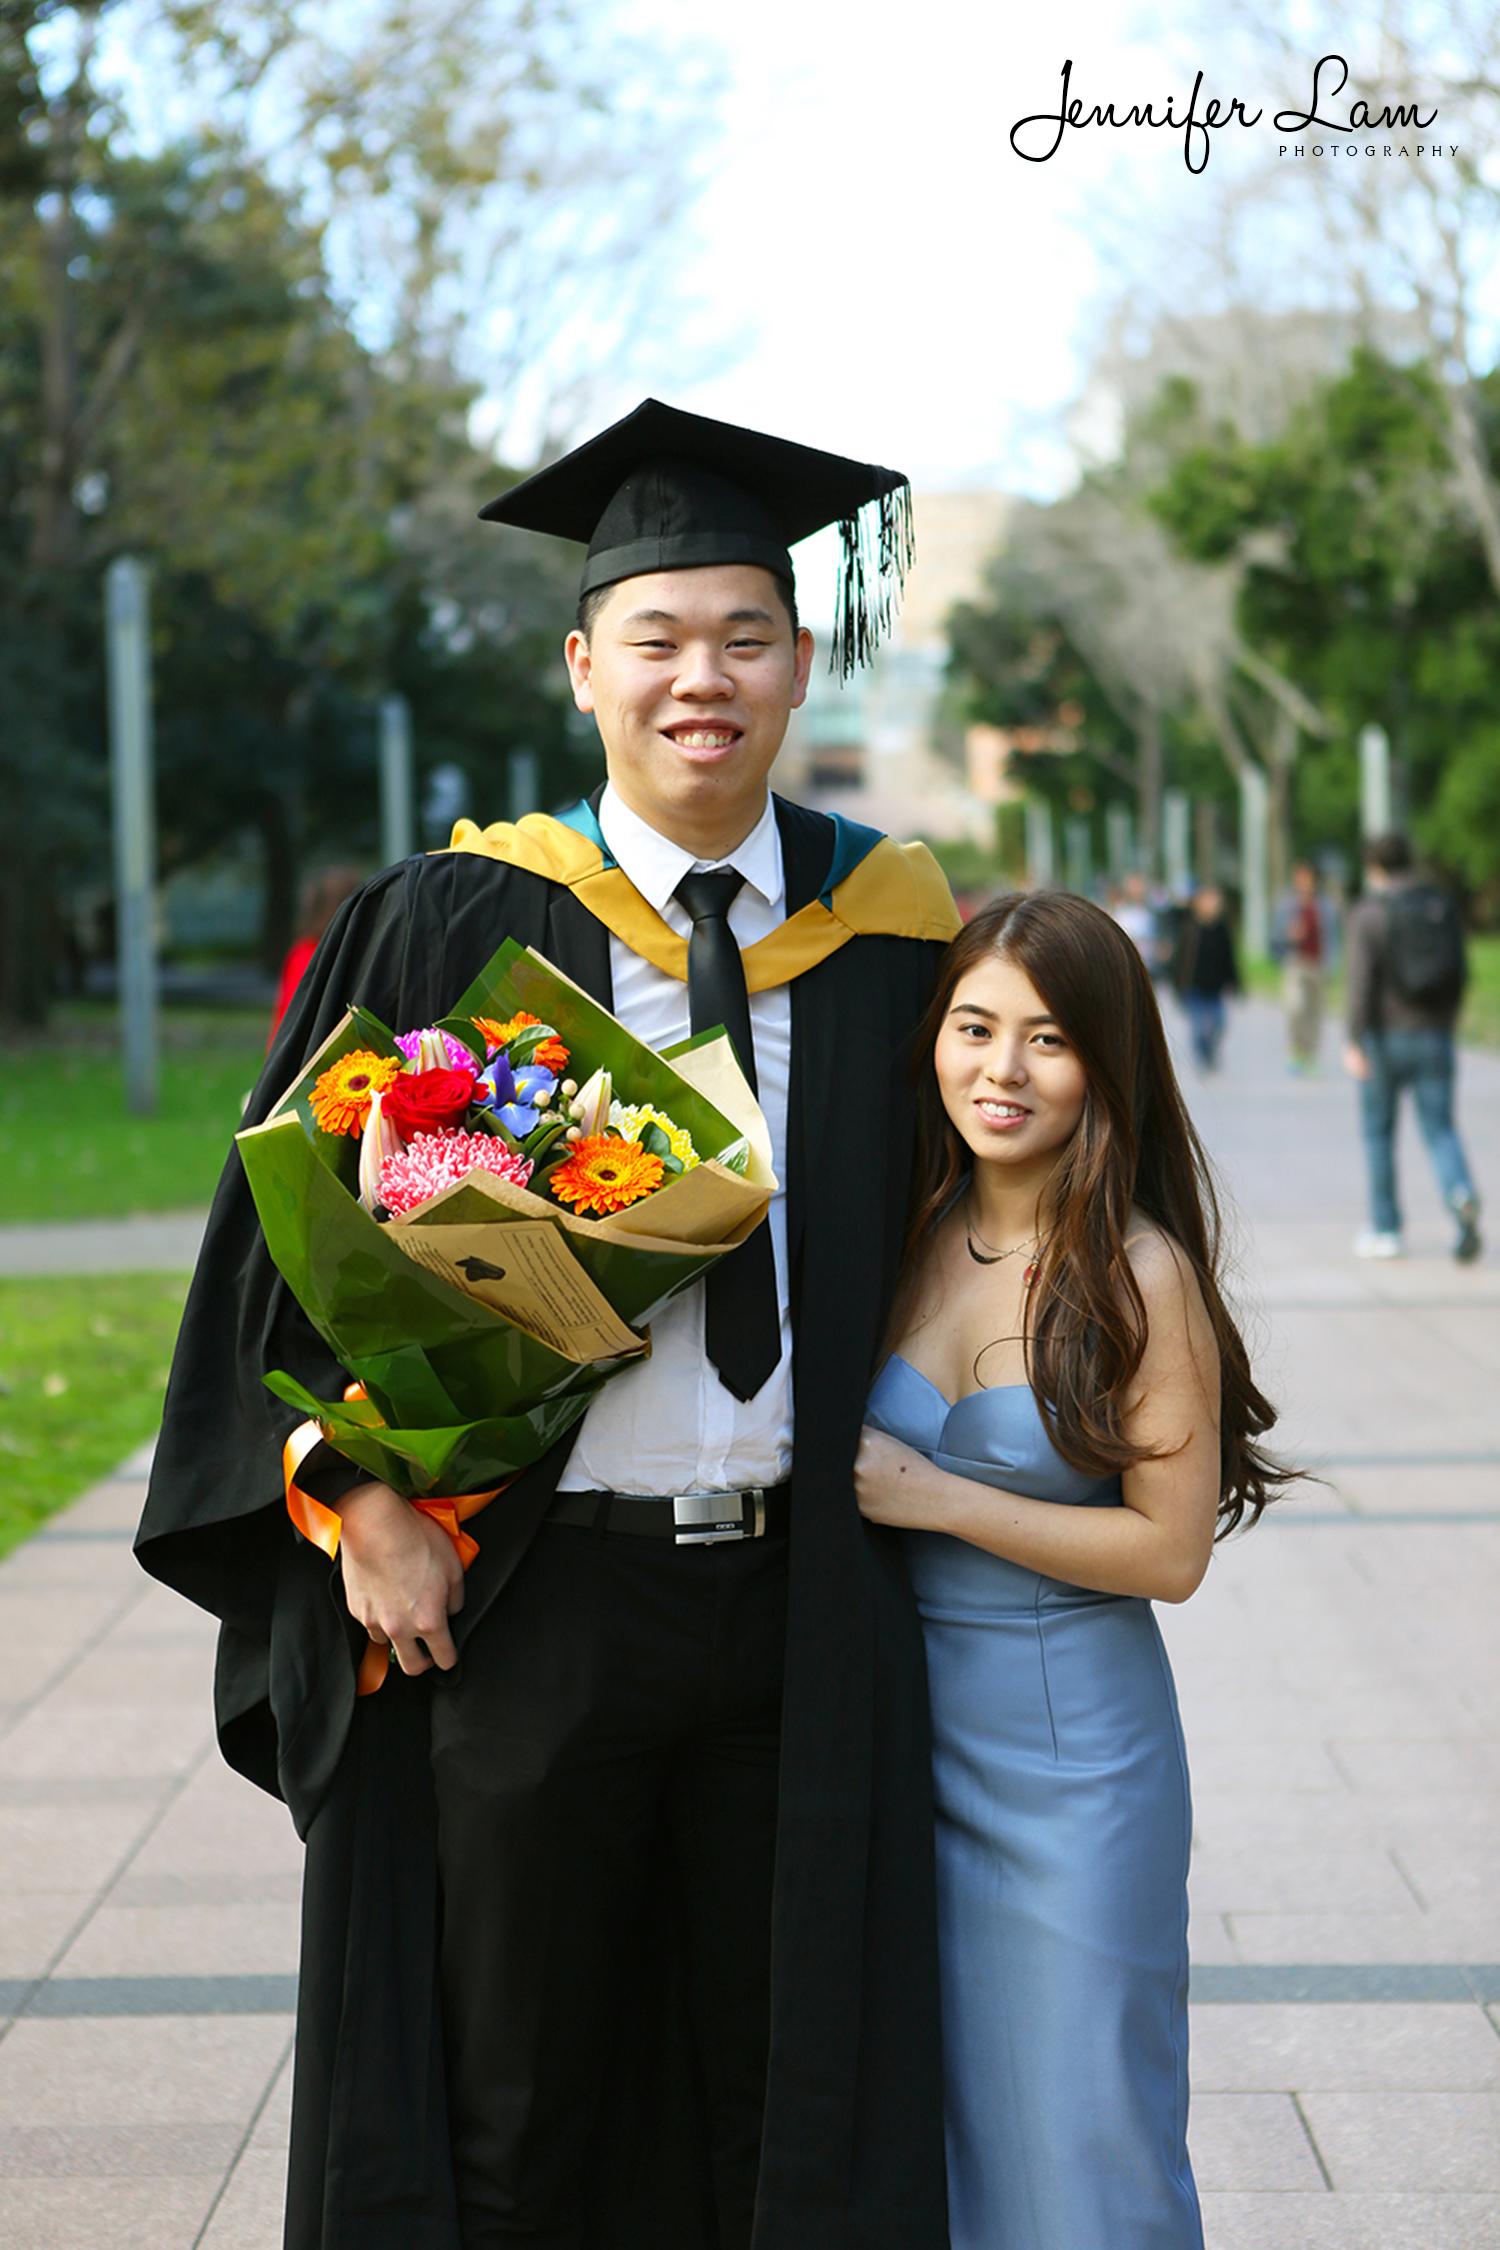 UNSW - Sydney Graduation Photos - Jennifer Lam Photography (6).JPG